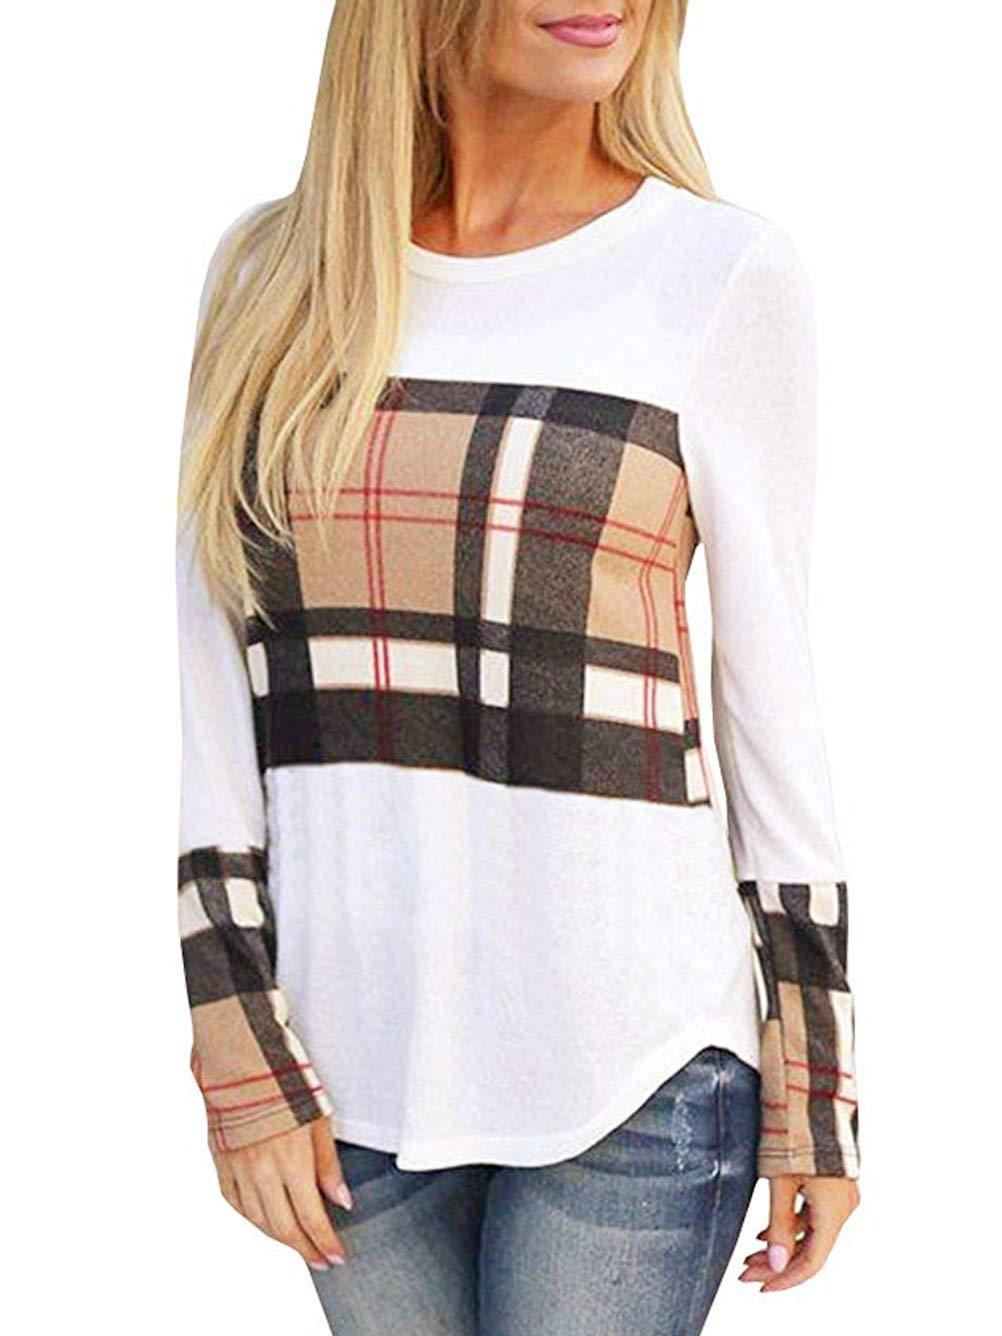 Kaei&Shi Plaid Long Sleeve Shirts for Women Patchwork Blouses Colorblock T Shirt Pattern Womens Top White Small